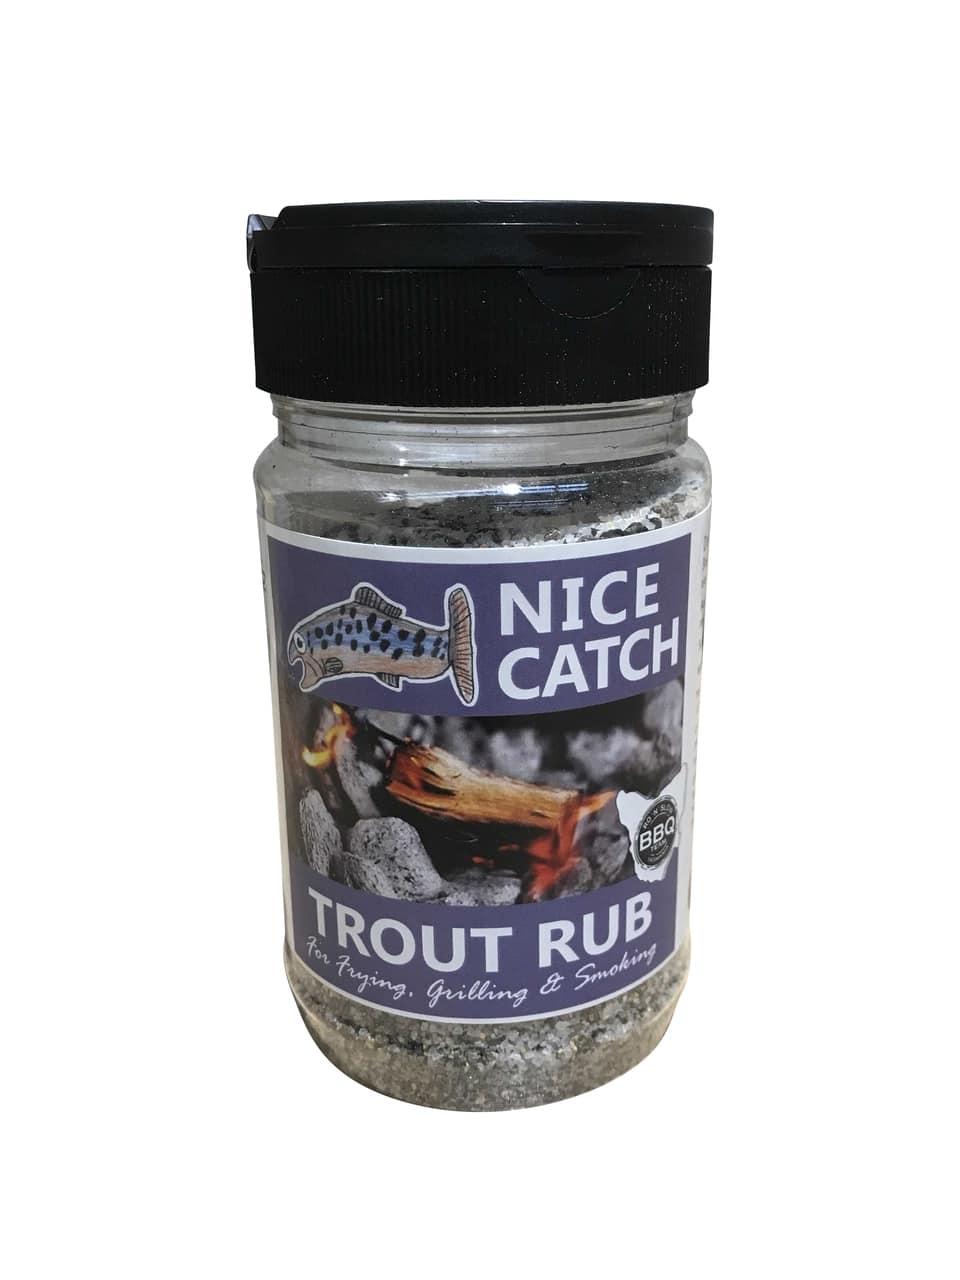 Nice Catch - Trout Rub